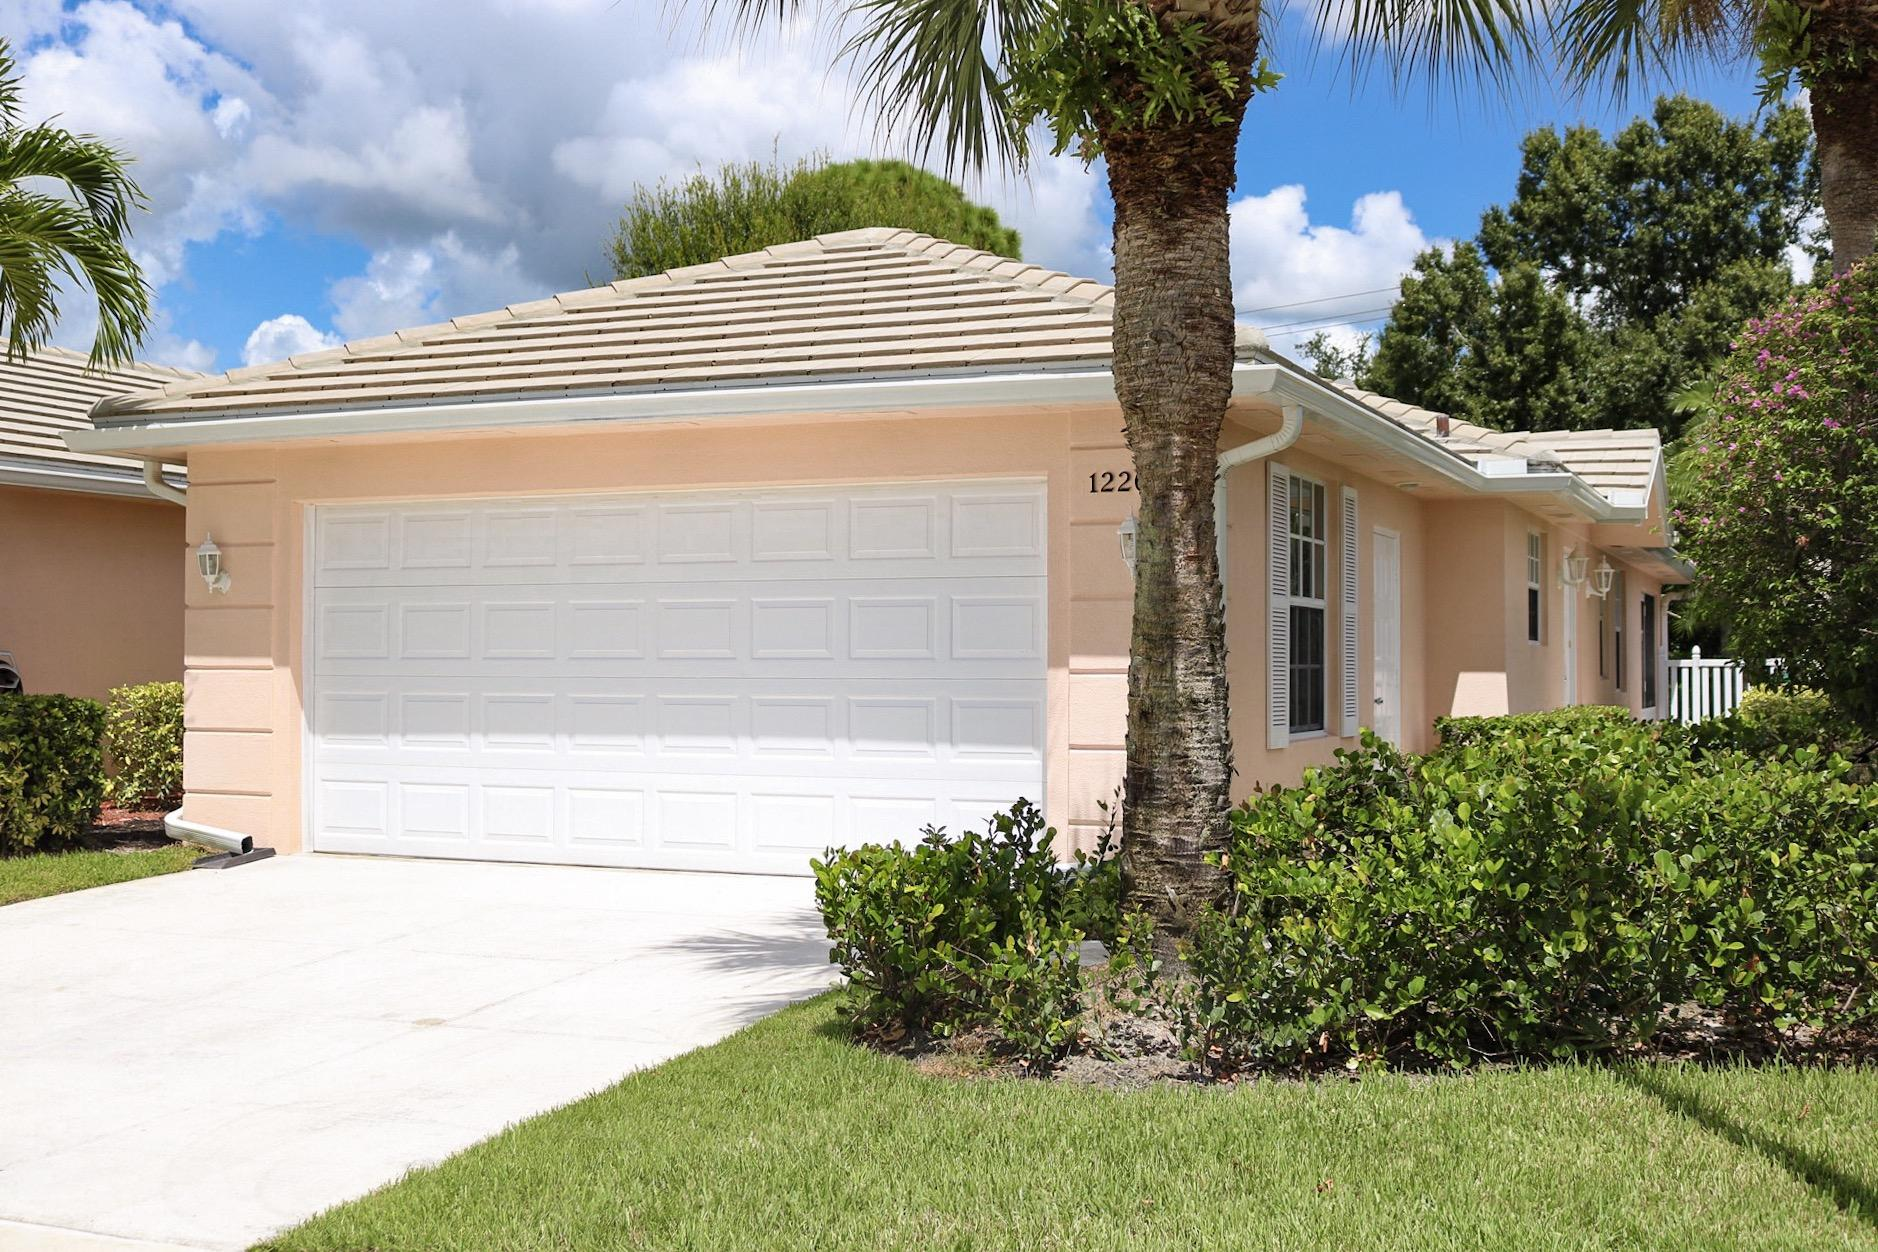 1226 Nw Bentley Circle, Port Saint Lucie, FL 34986